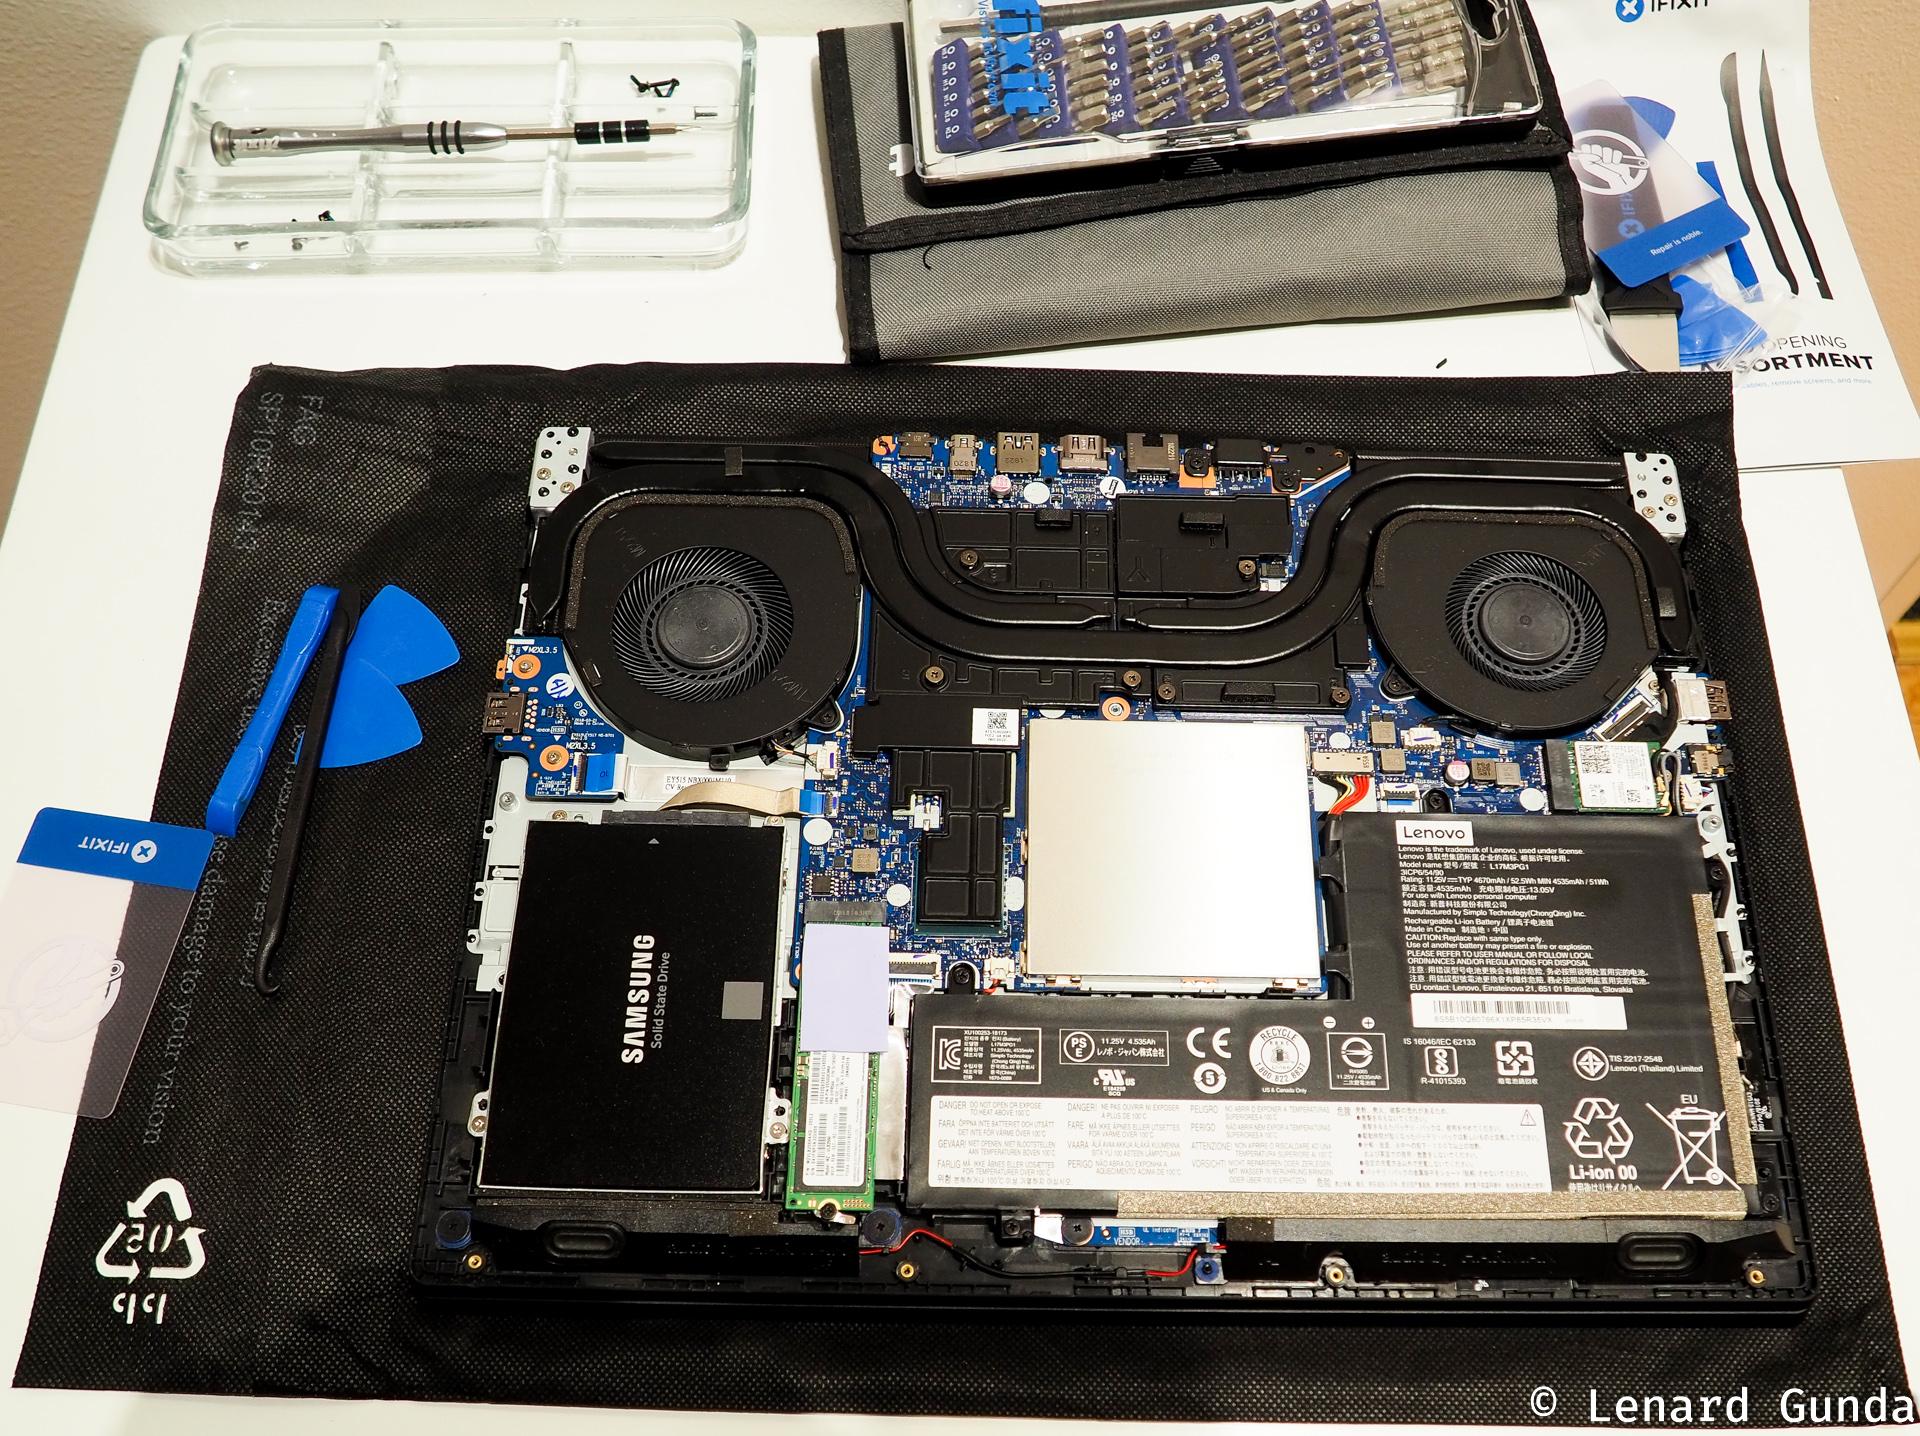 Legion Y530: RAM upgrade and maximum supported memory